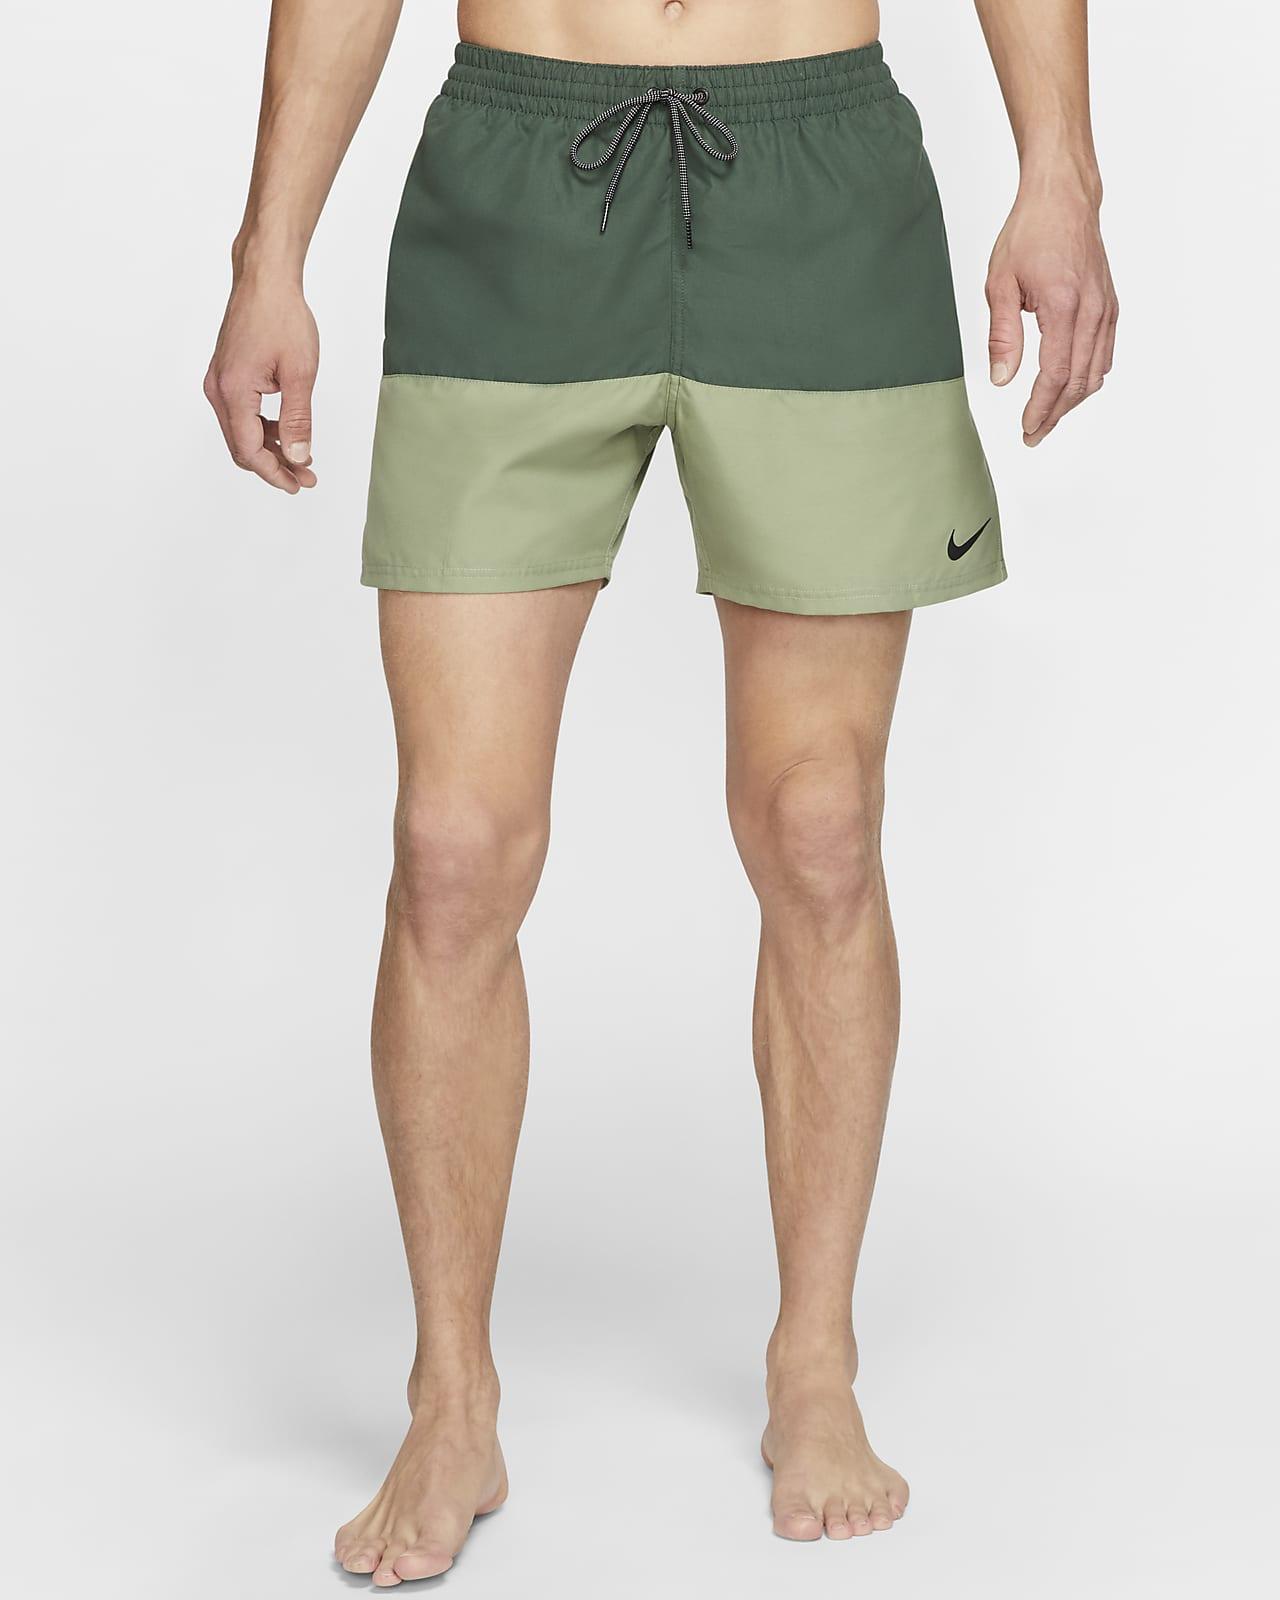 Nike Split Breaker Men's 13cm (approx.) Swimming Shorts